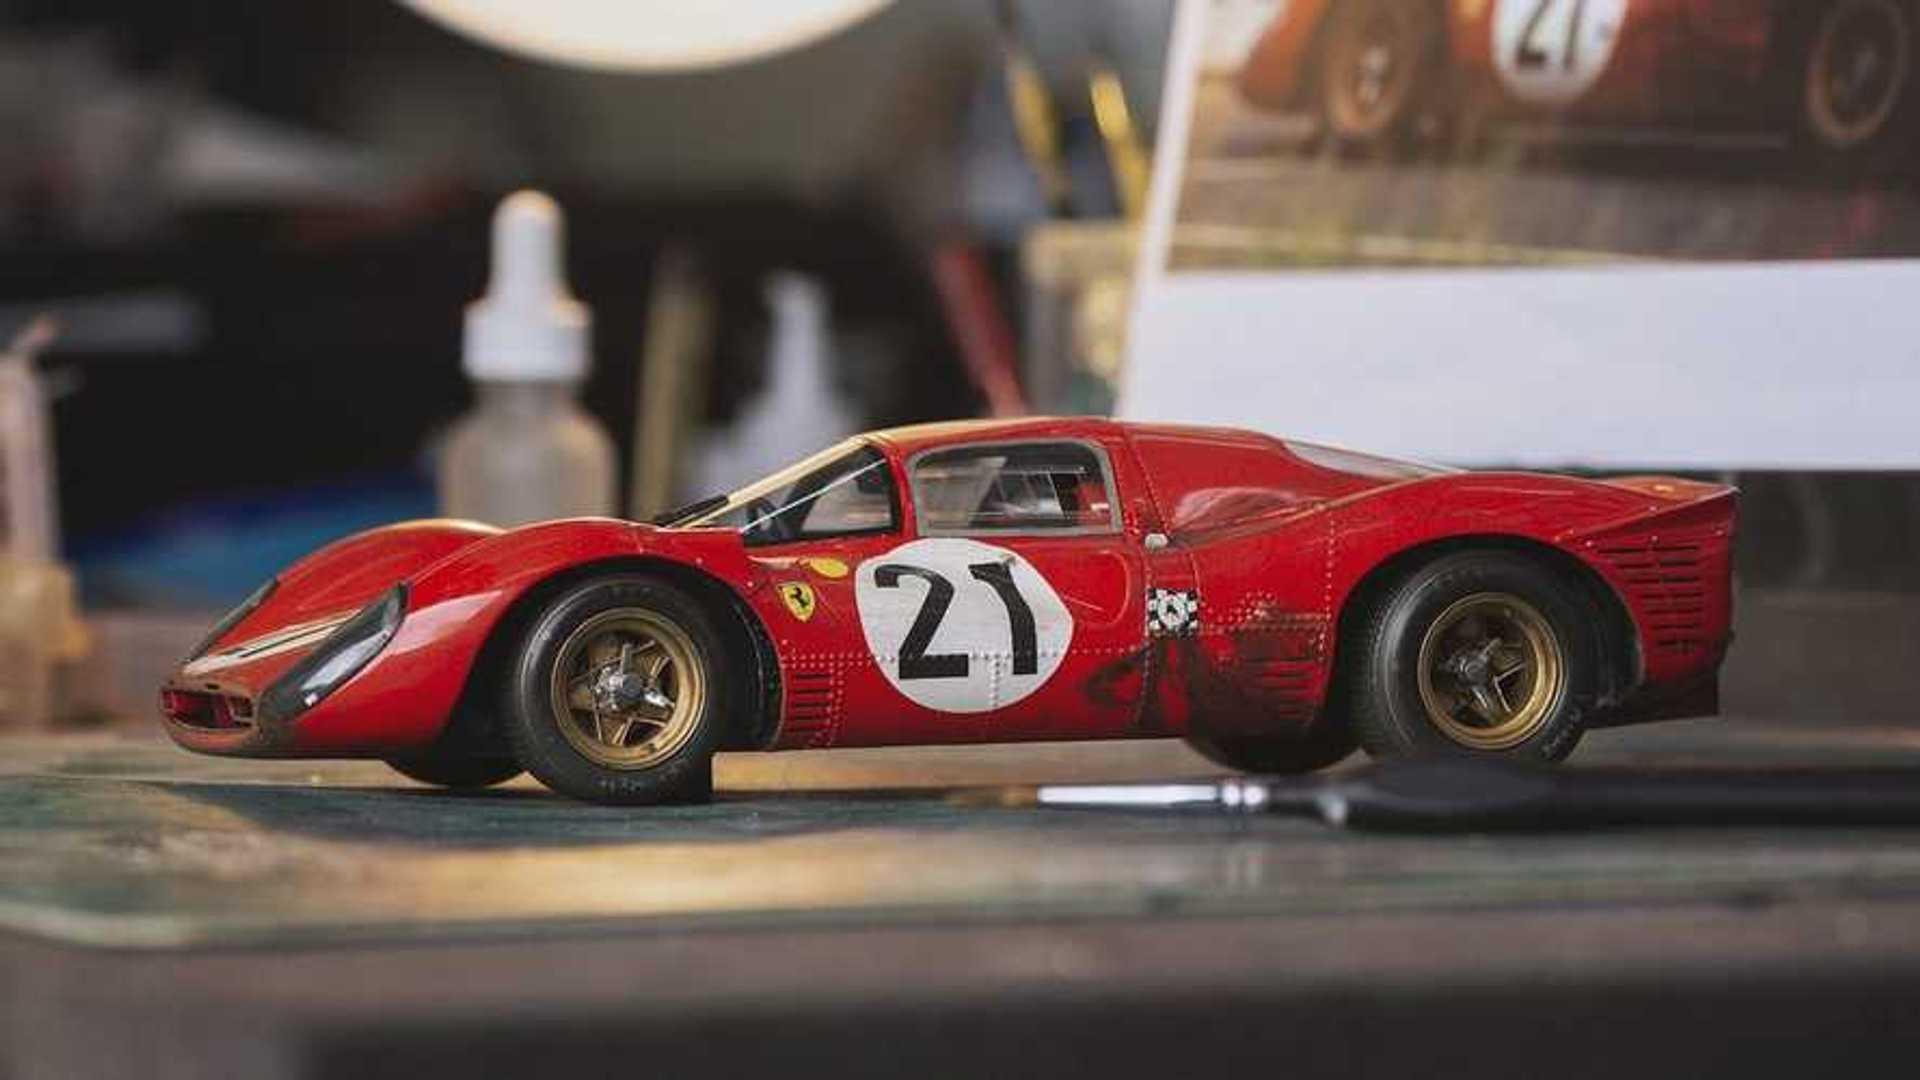 Amalgam Debuts Small Scale Weathered Ferrari 330 P4 Le Mans Model